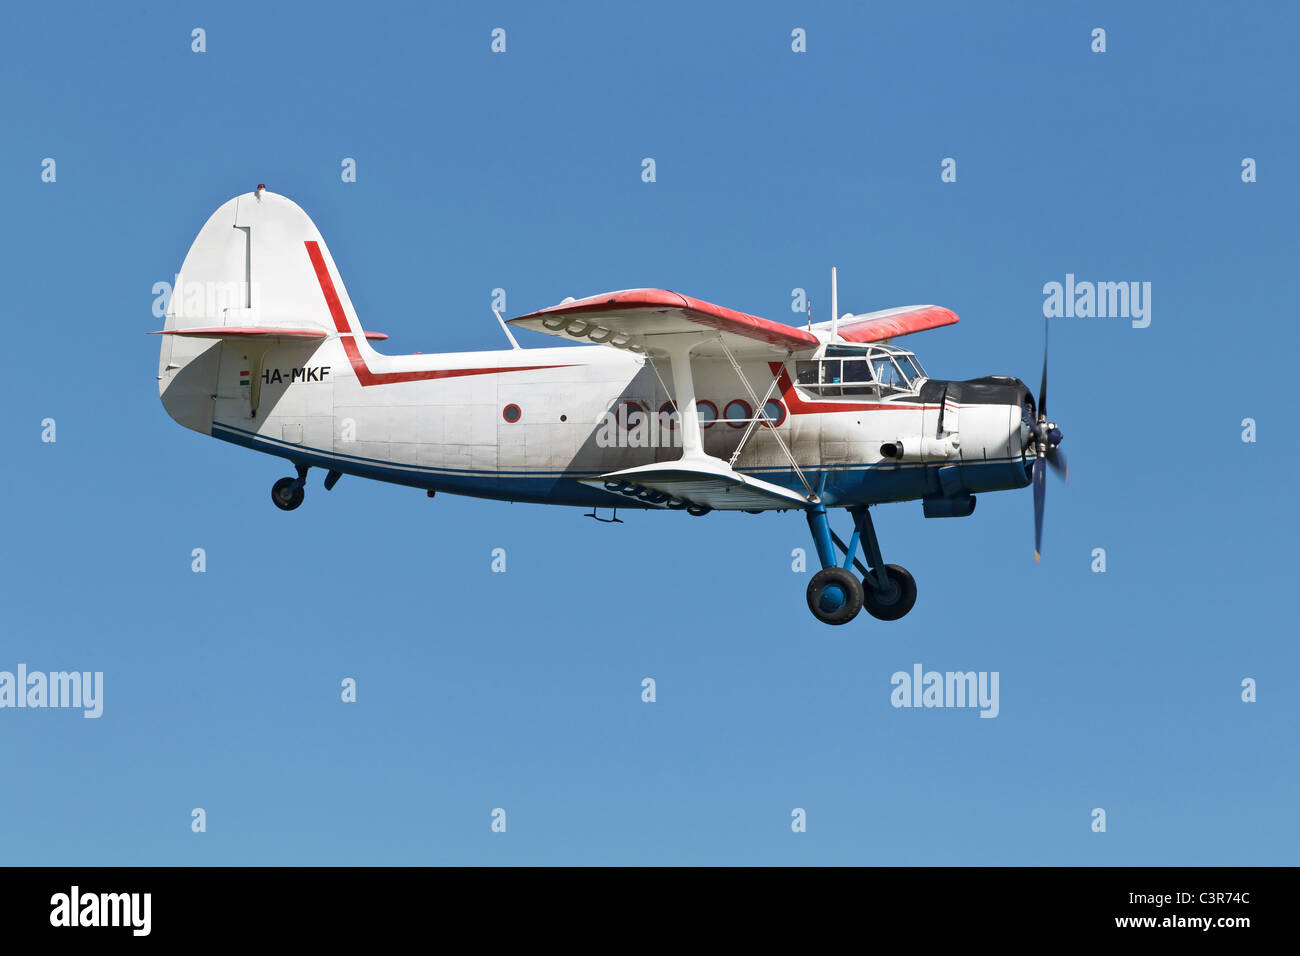 A veteran soviet/ Russian Antonov AN2 heavy duty bi-plane - Stock Image